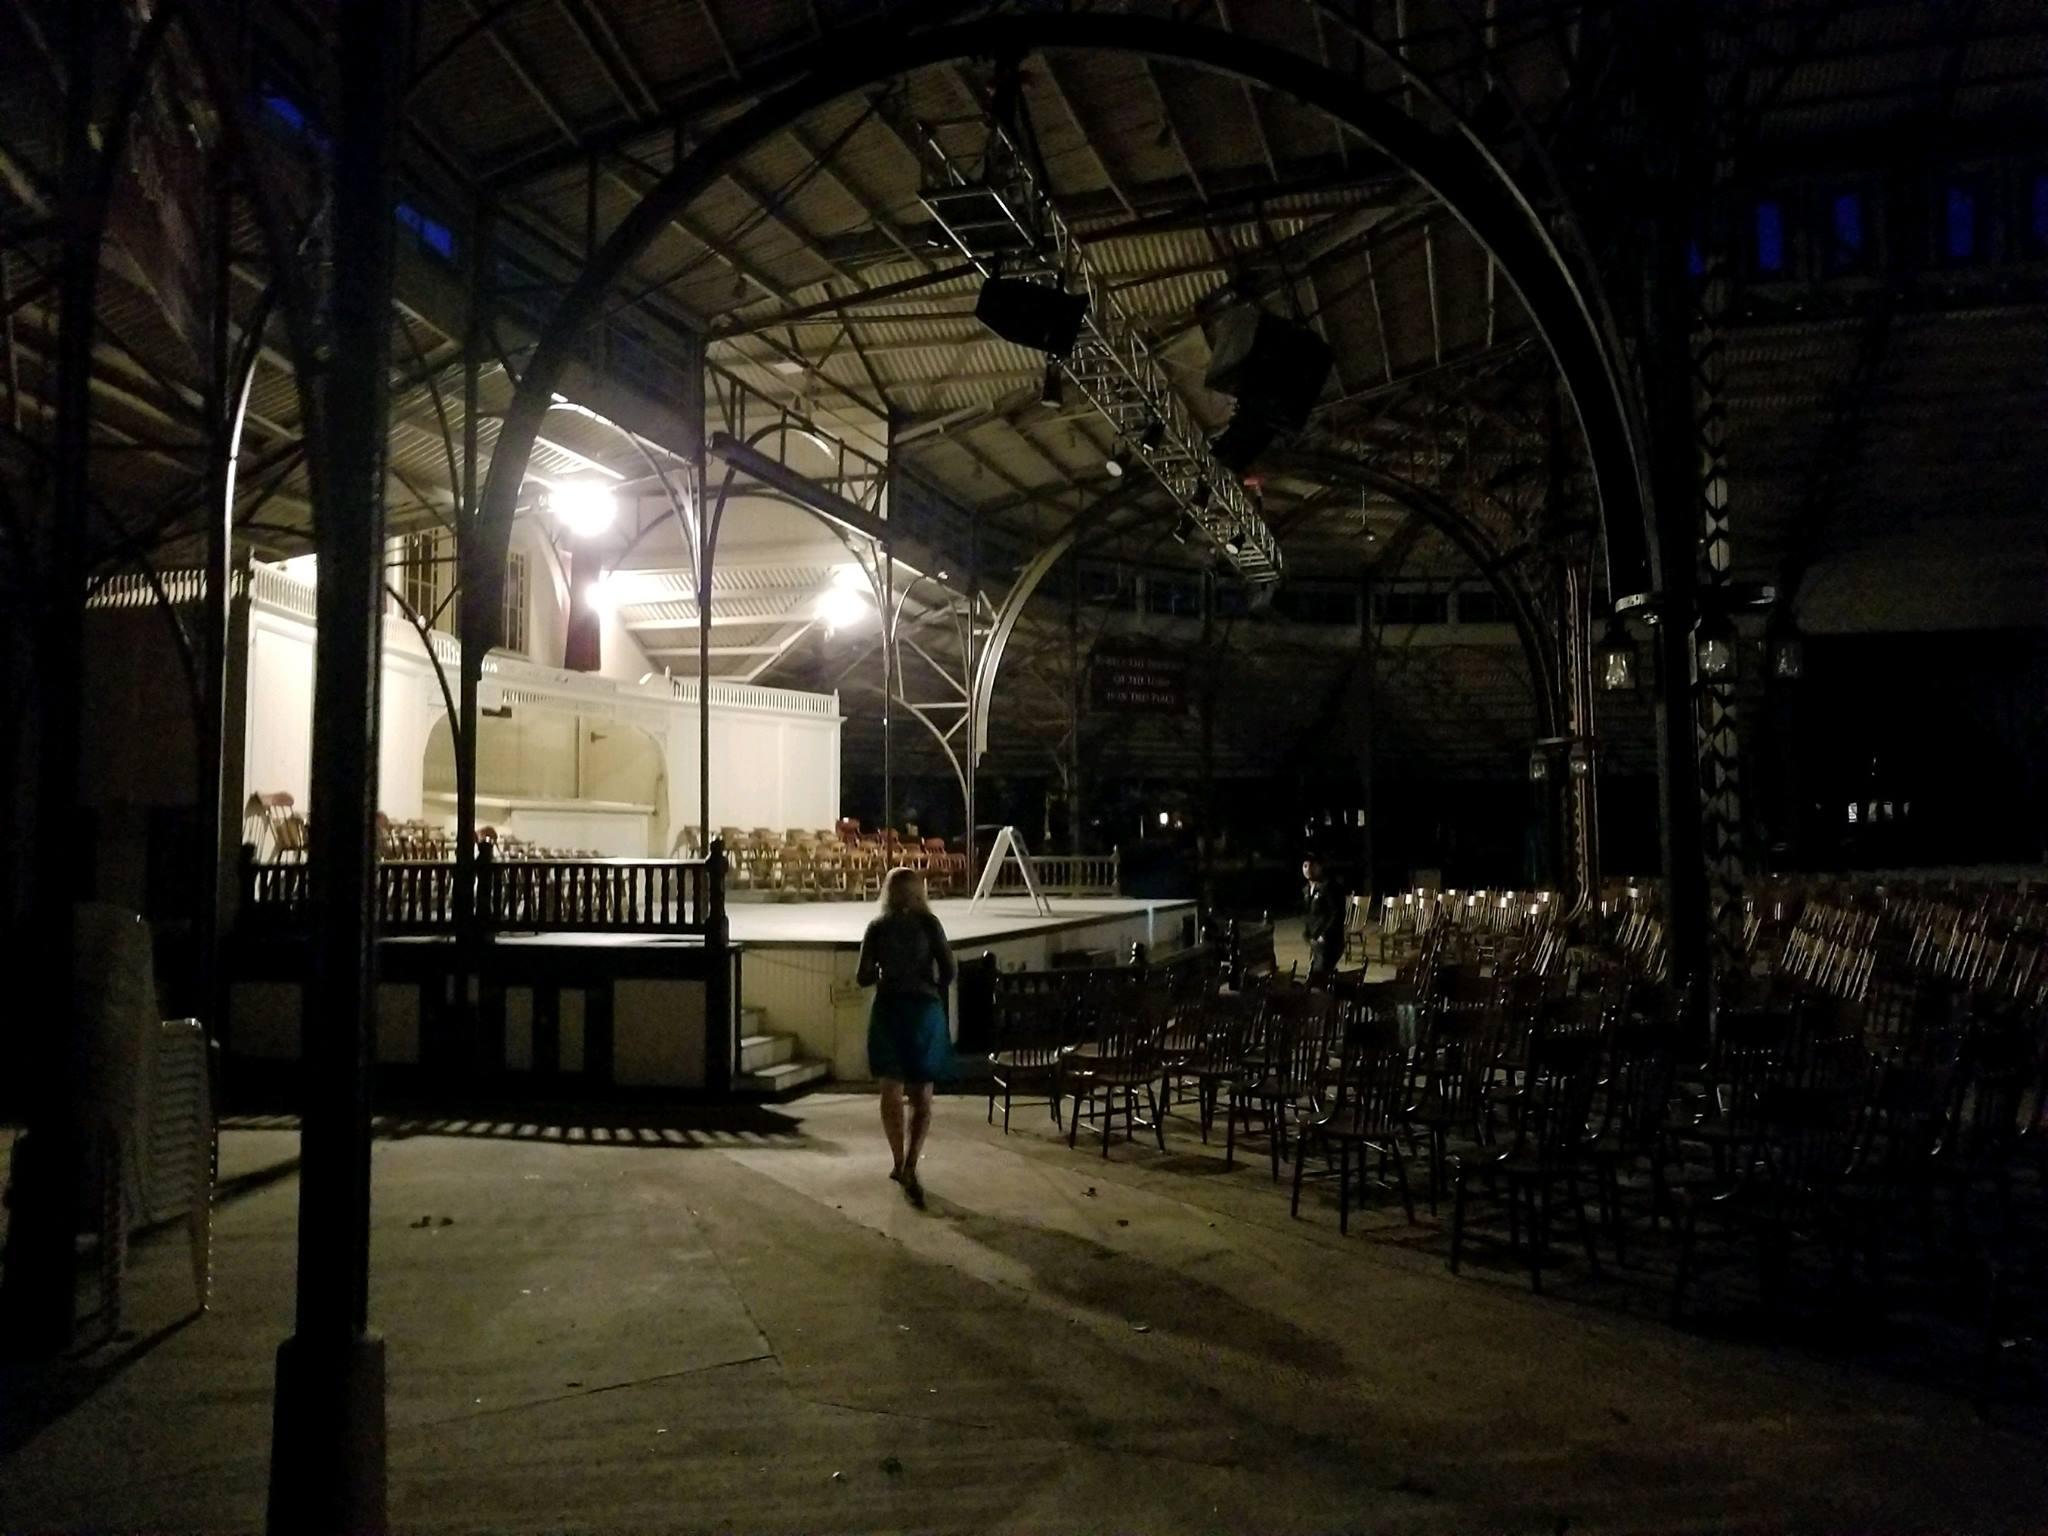 Tabernacle, creepy by night.